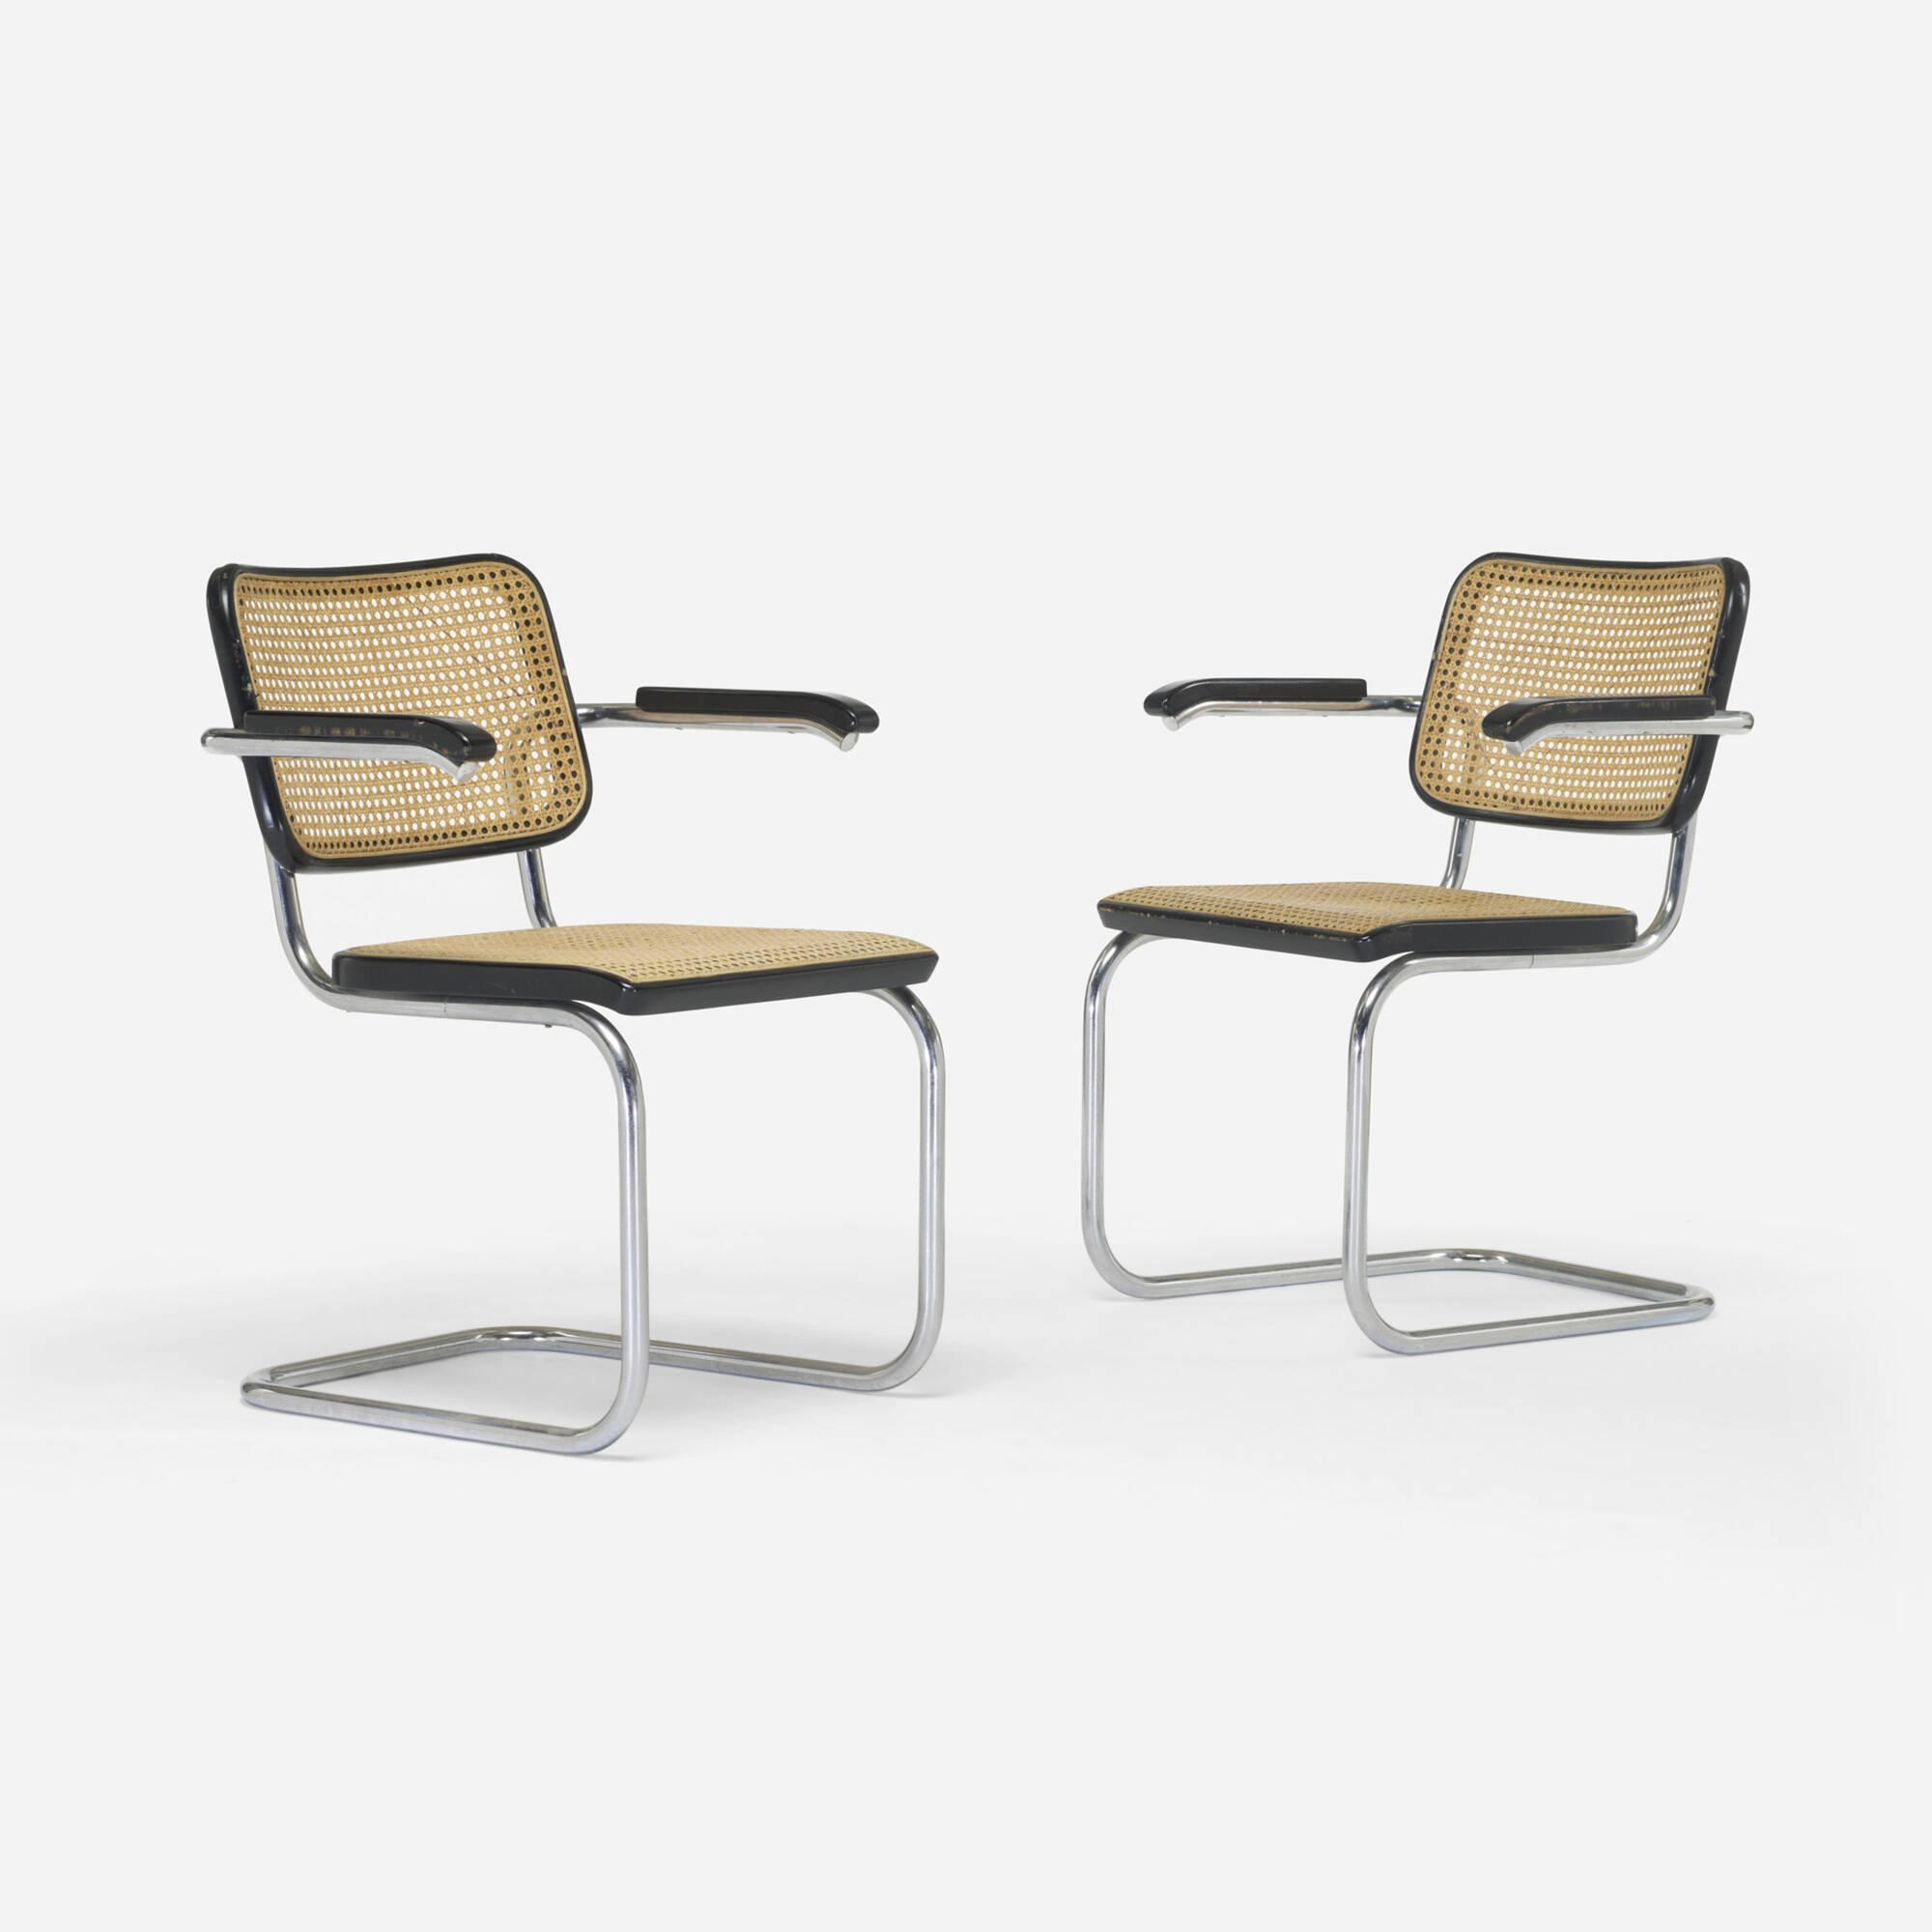 162: Marcel Breuer / Cesca Chairs, Pair (1 Of 6)